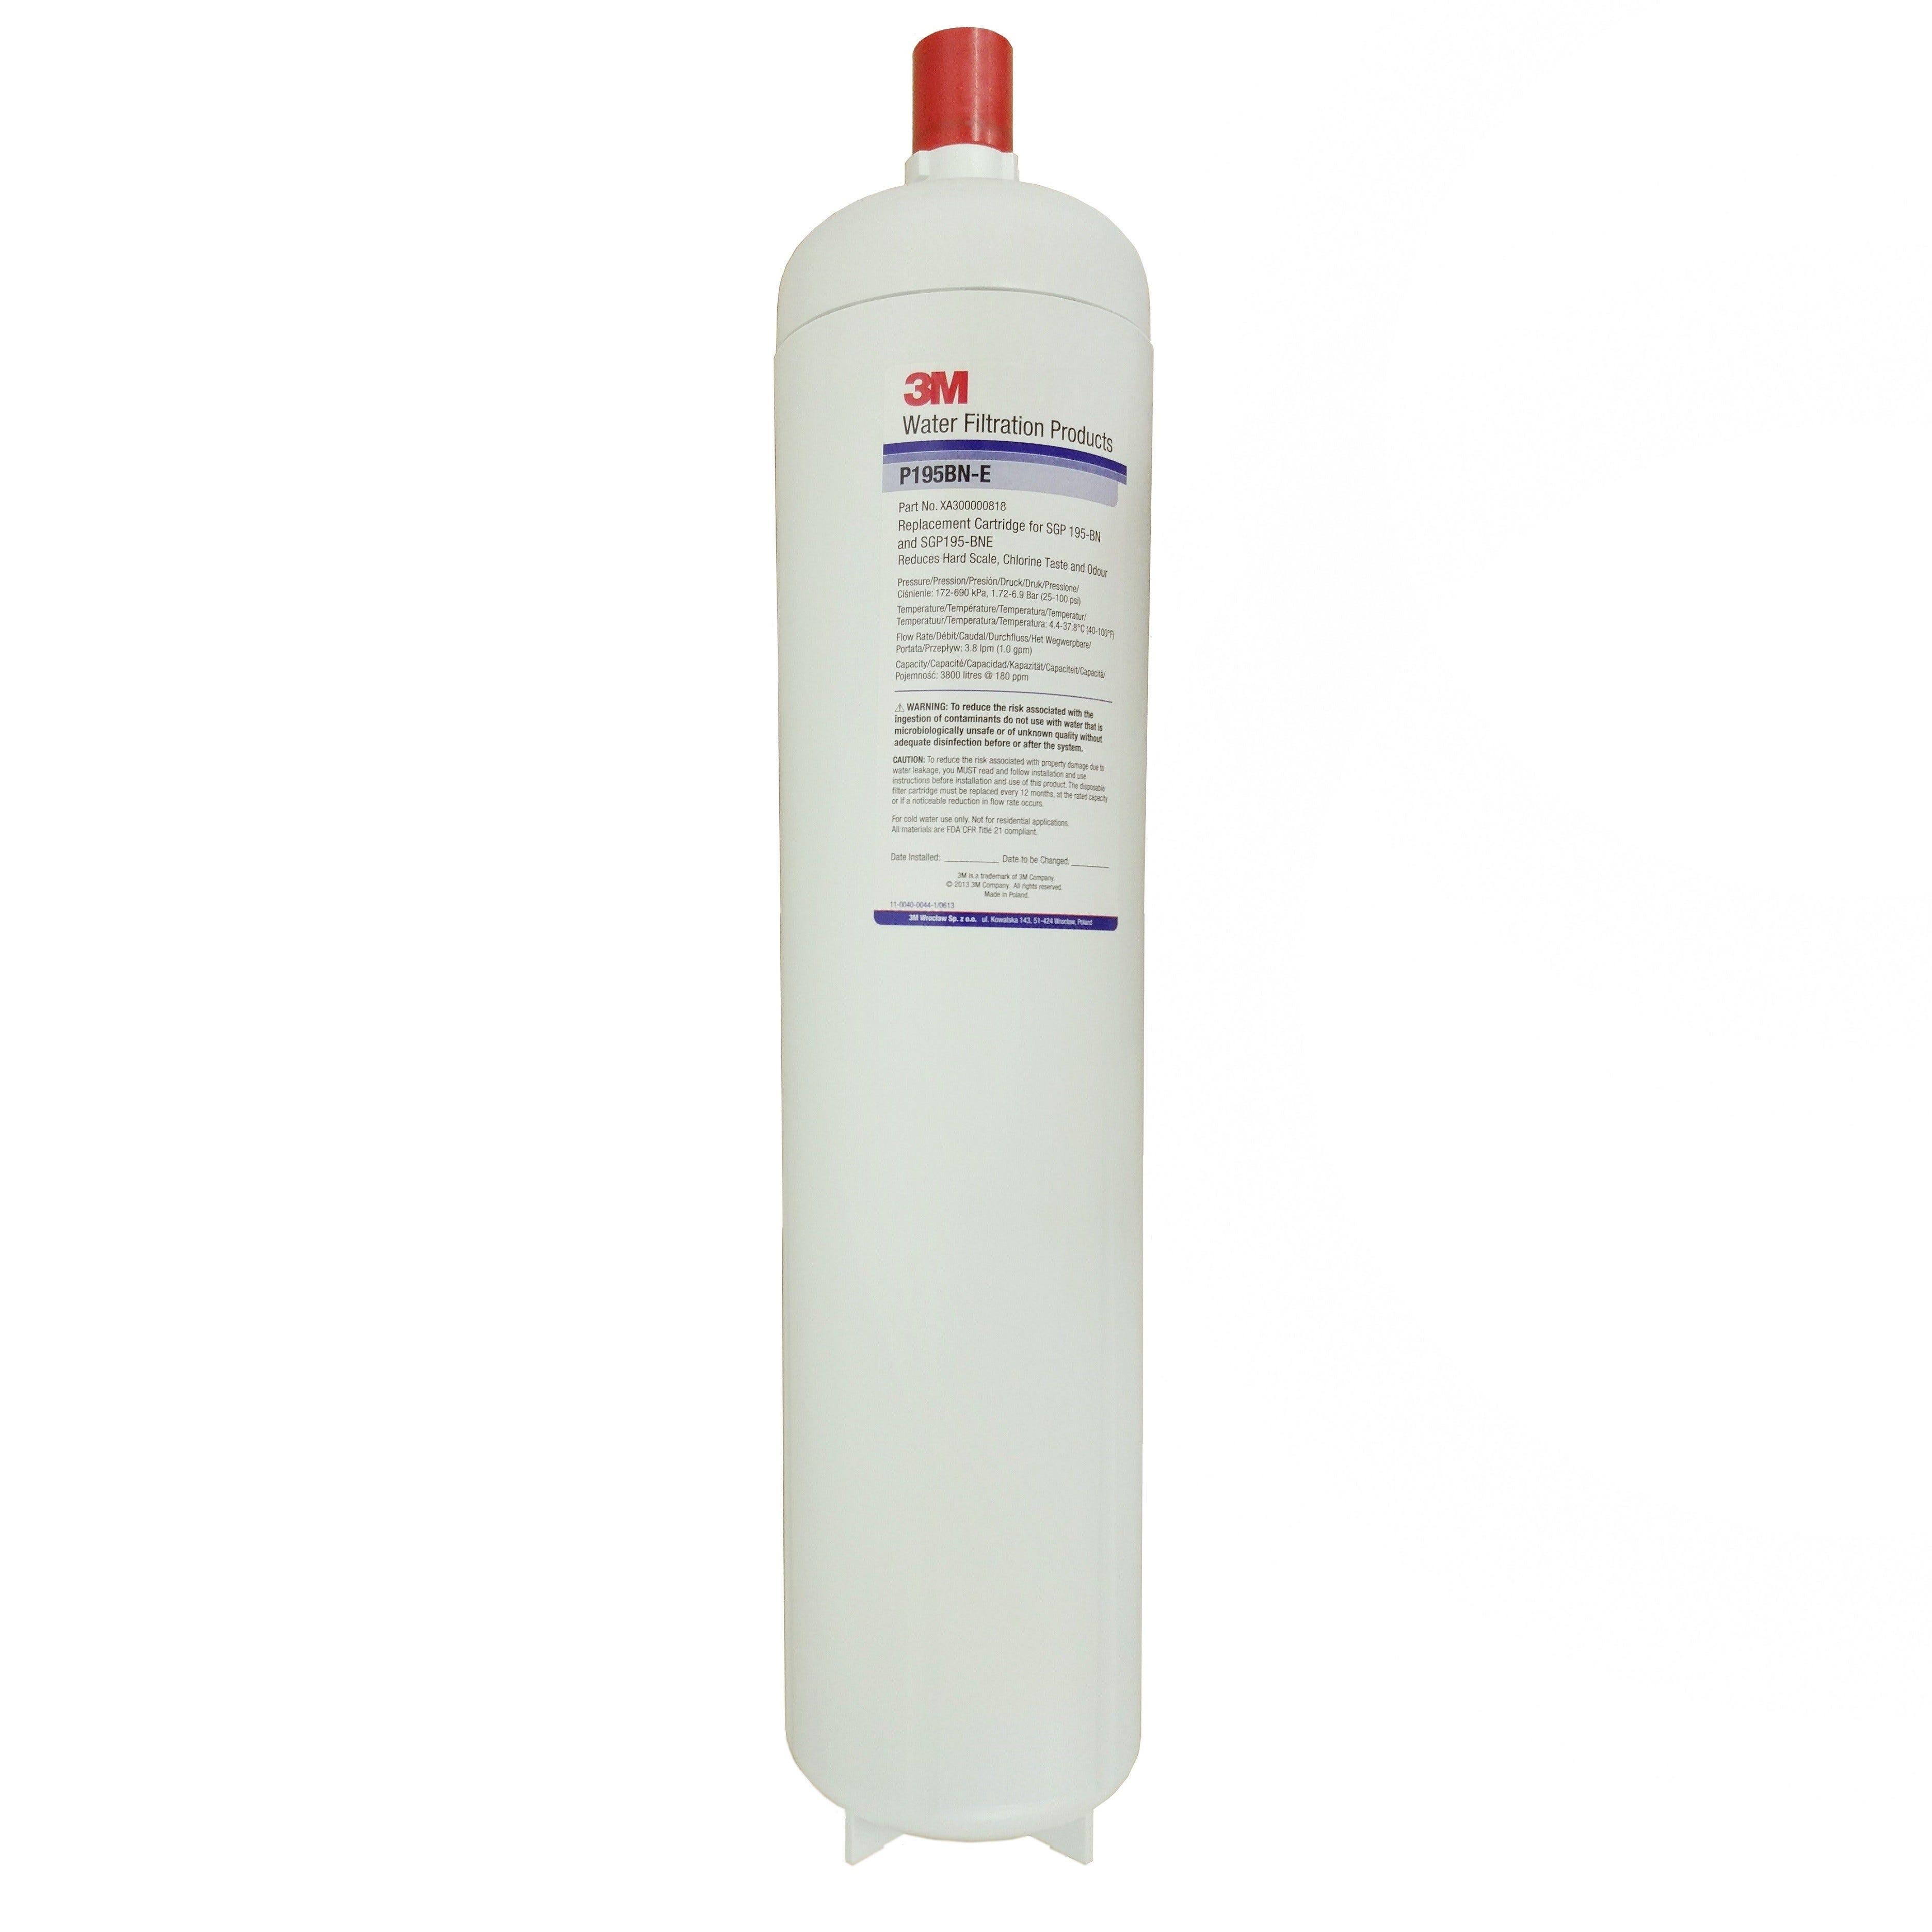 3M ScaleGard Pro SGP195BN-E Water Filter - Zip FL3600 & Instanta AQ50 Compatible